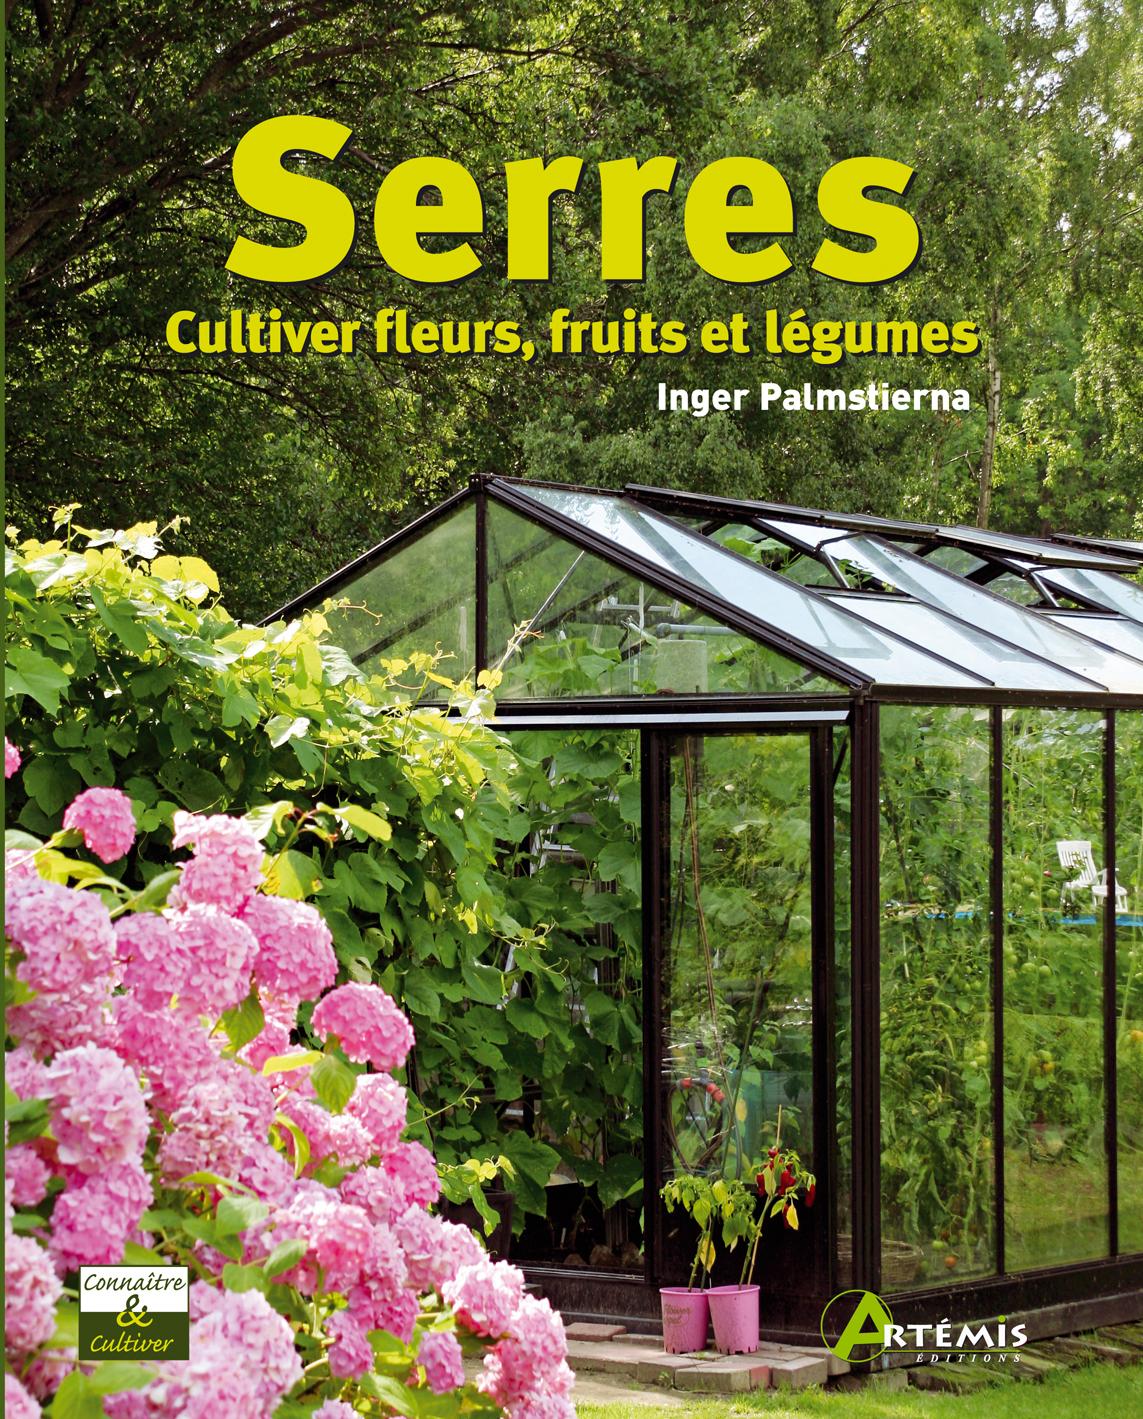 SERRES. CULTIVER FLEURS, FRUITS ET LEGUMES